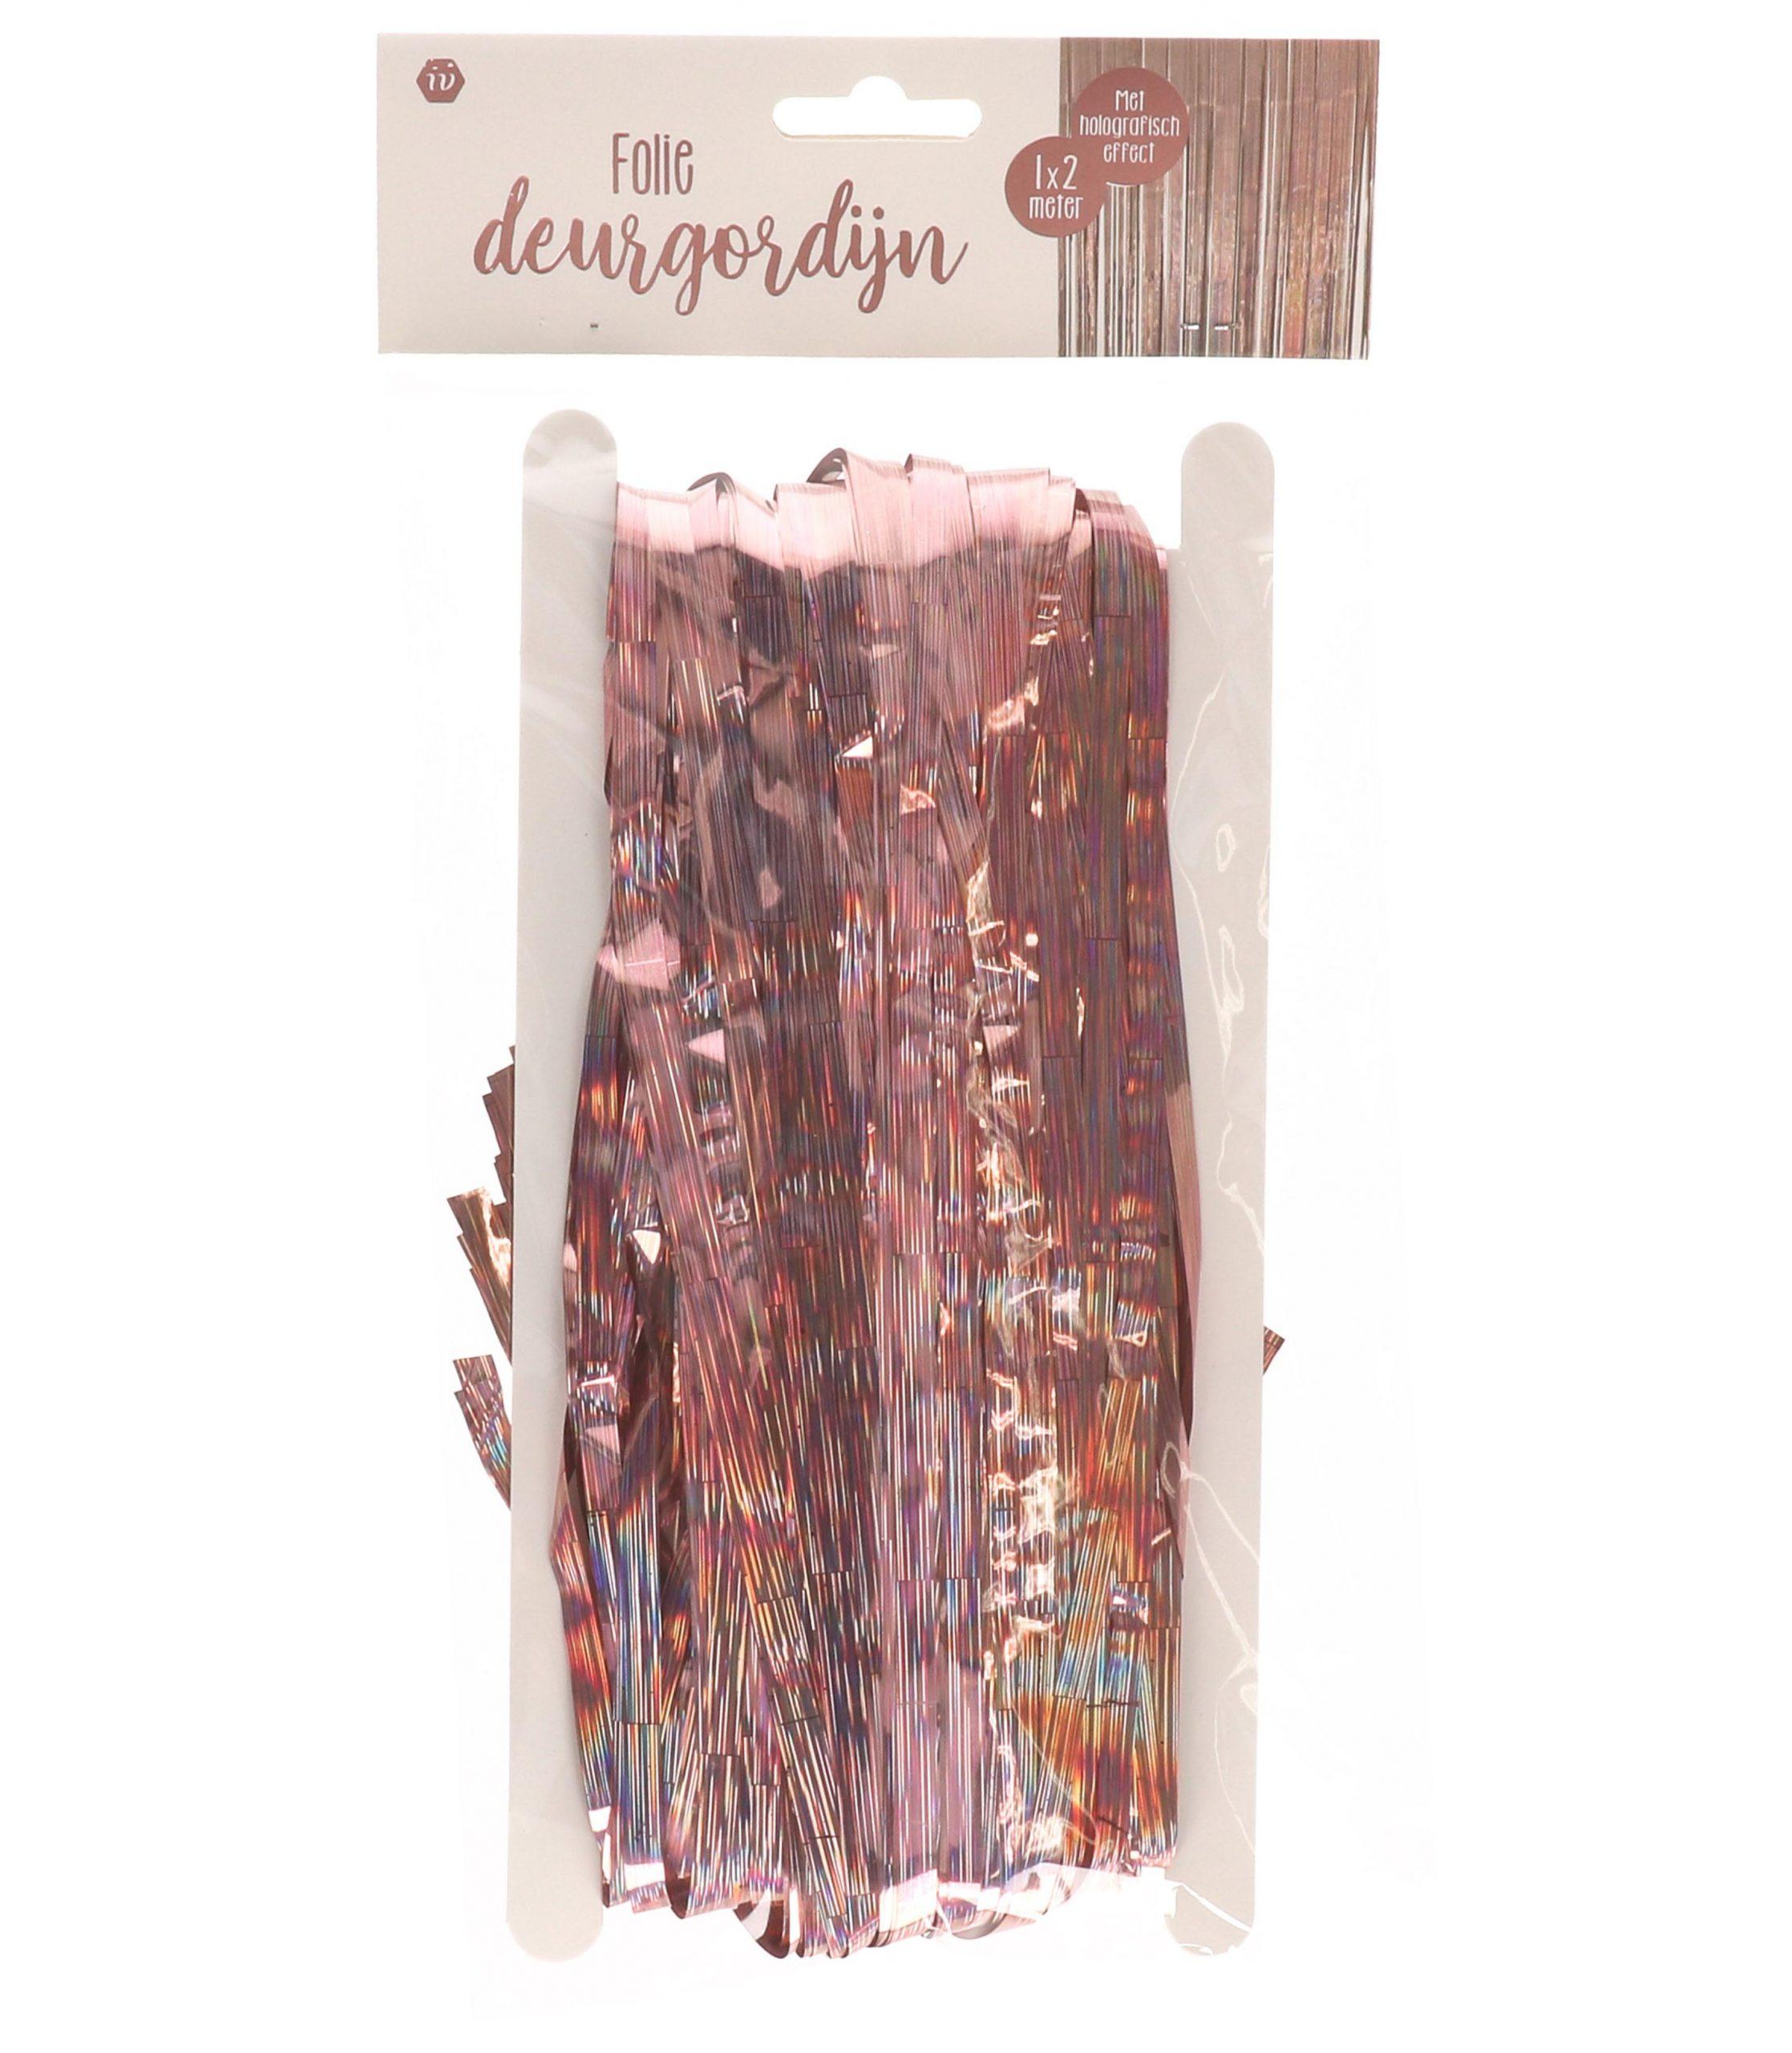 Foliedeurgordijn rose-goud/holografisch